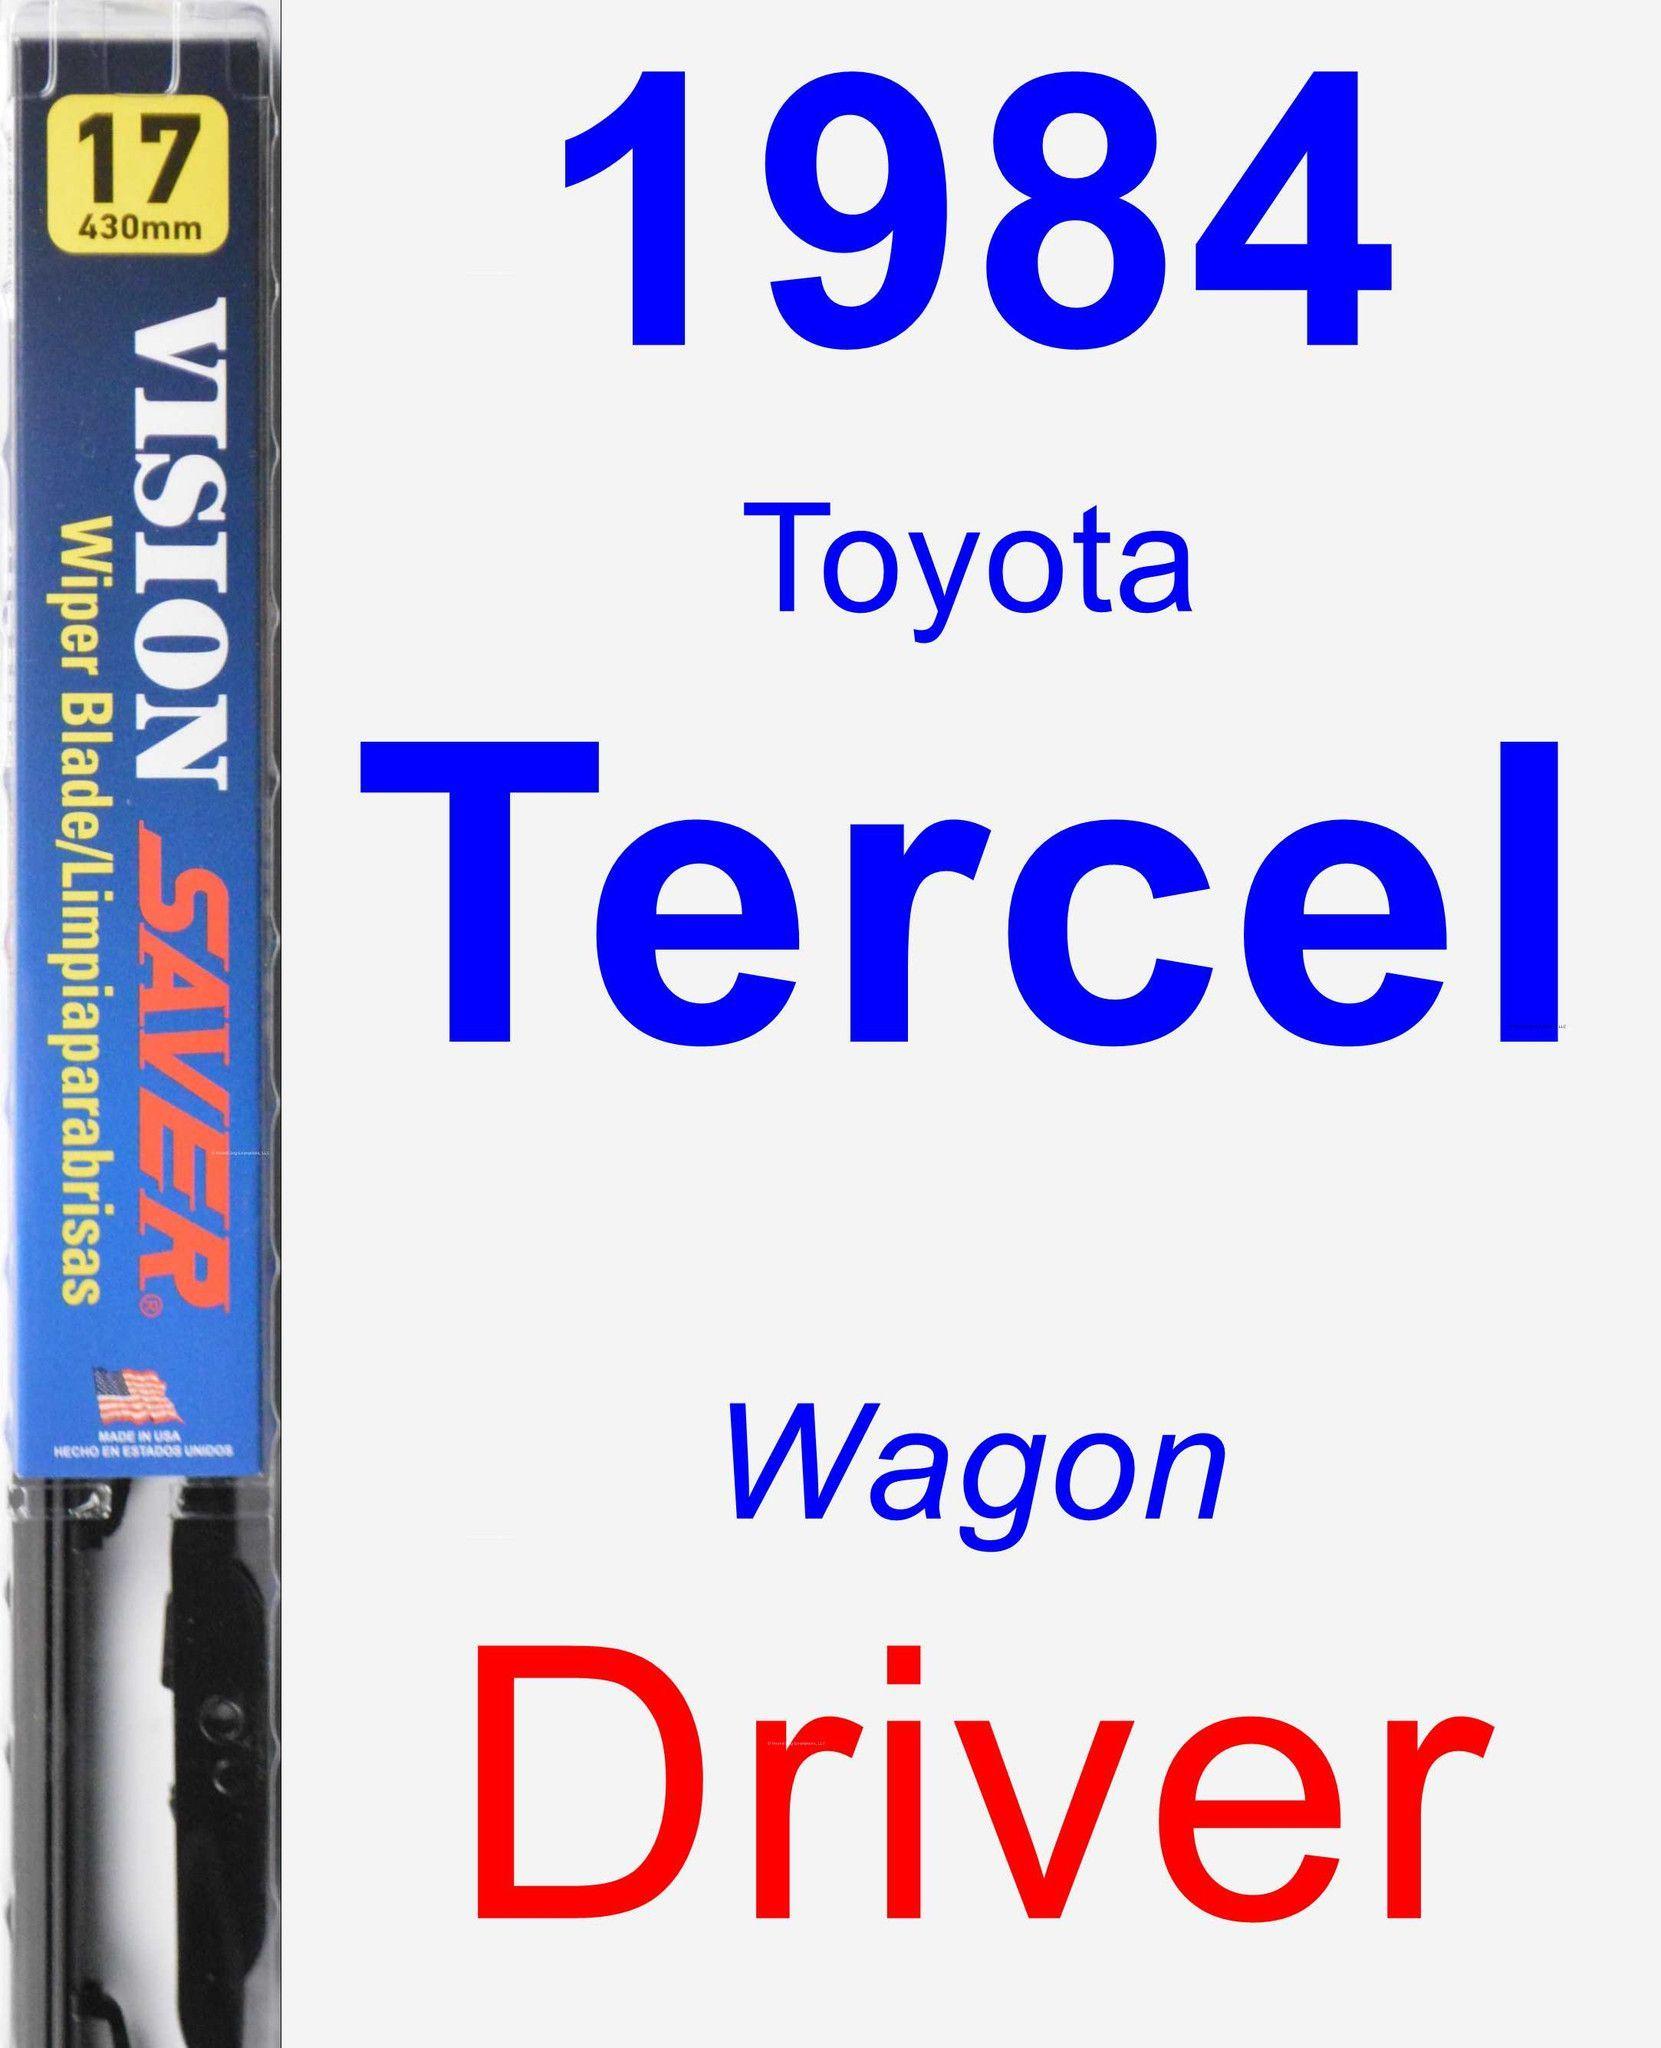 Driver Wiper Blade for 1984 Toyota Tercel - Vision Saver